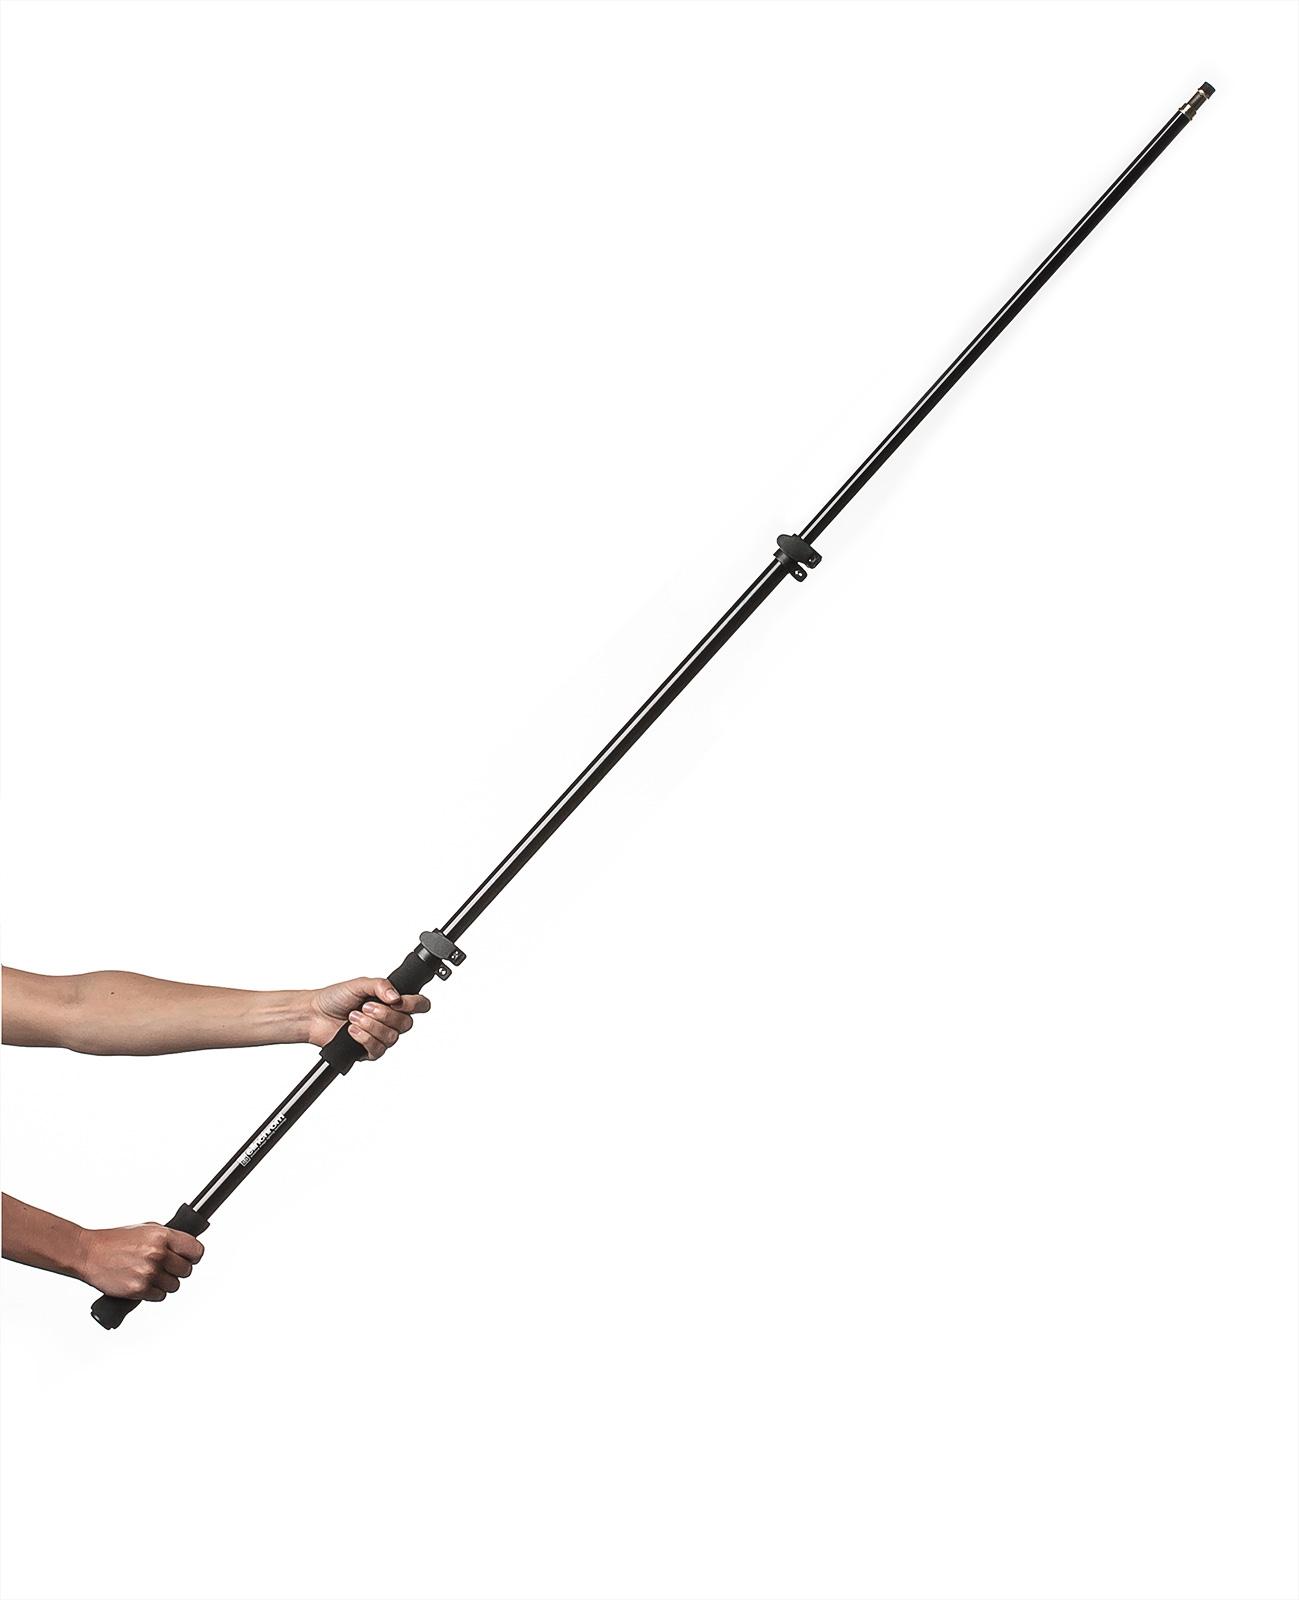 Elinchrom Boom Arm 63 - 156cm